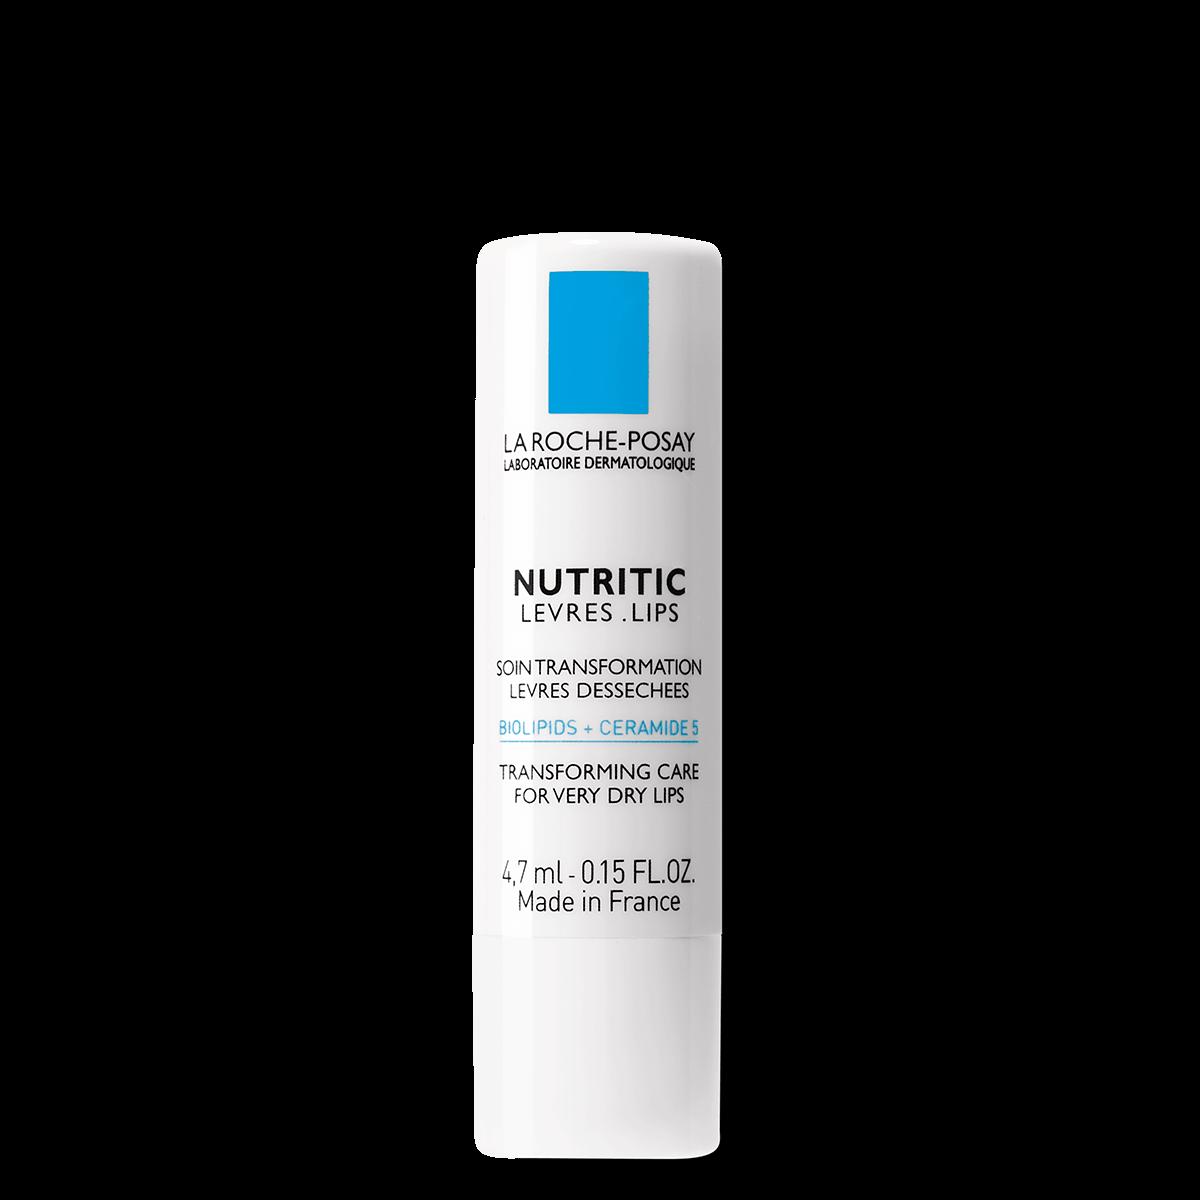 La Roche Posay ProduktSide Lip Balm Nutritic Lips Transforming Care Ve